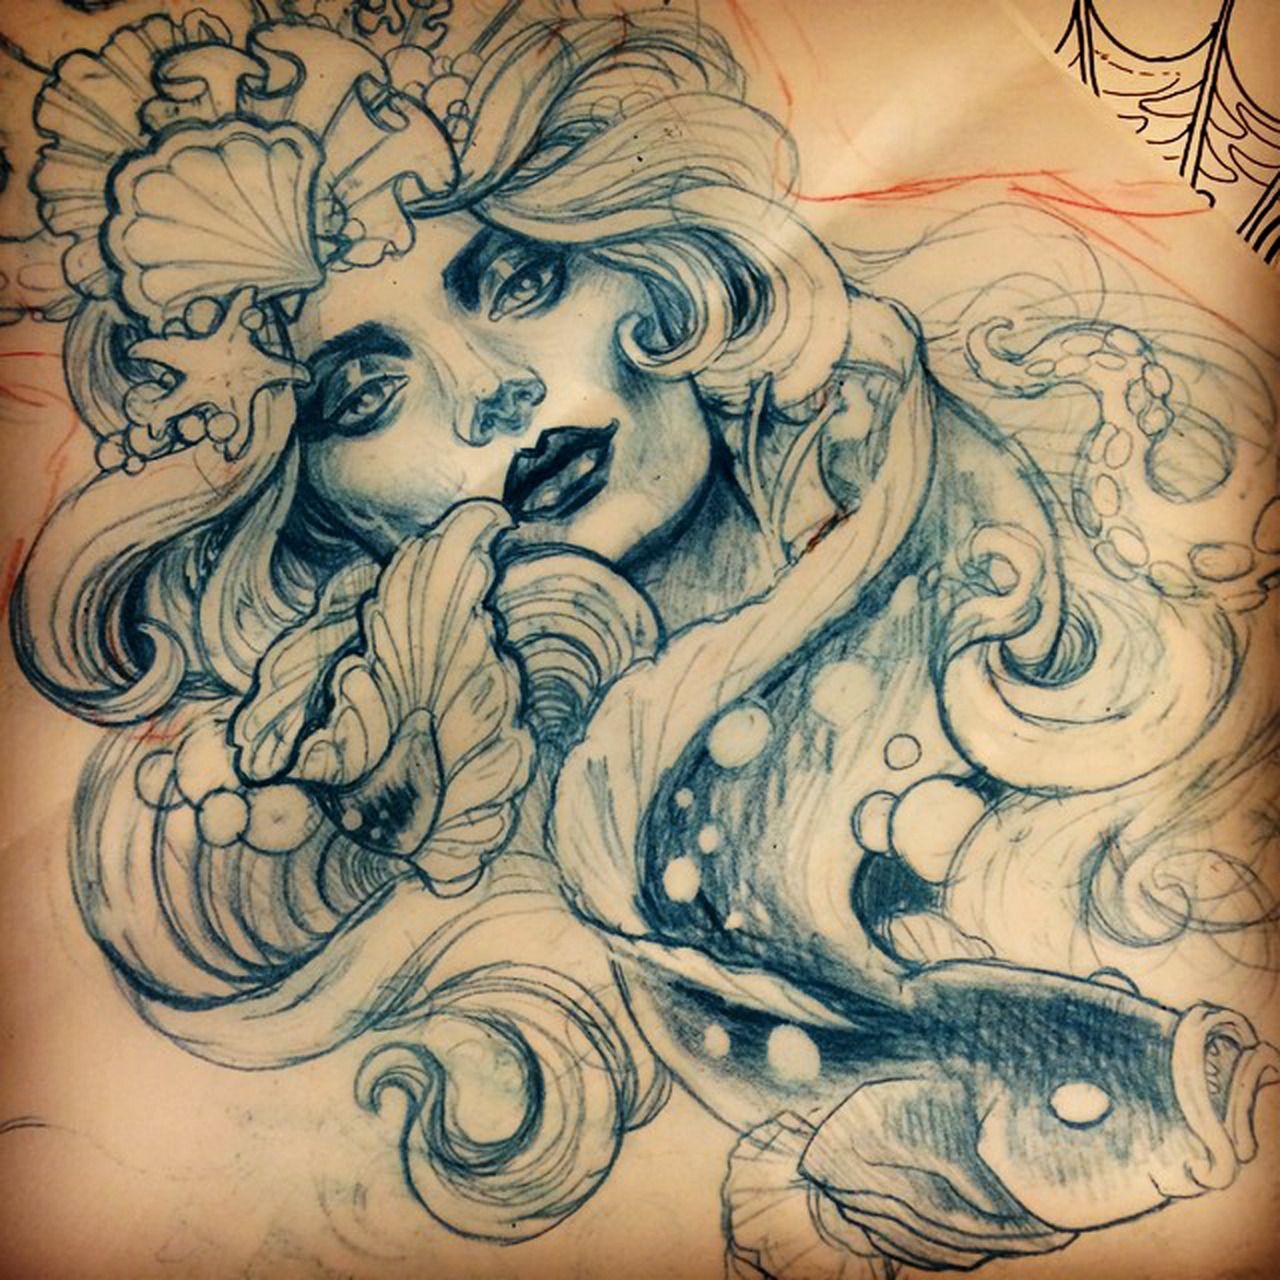 Traditional Mermaid Tattoo Drawing